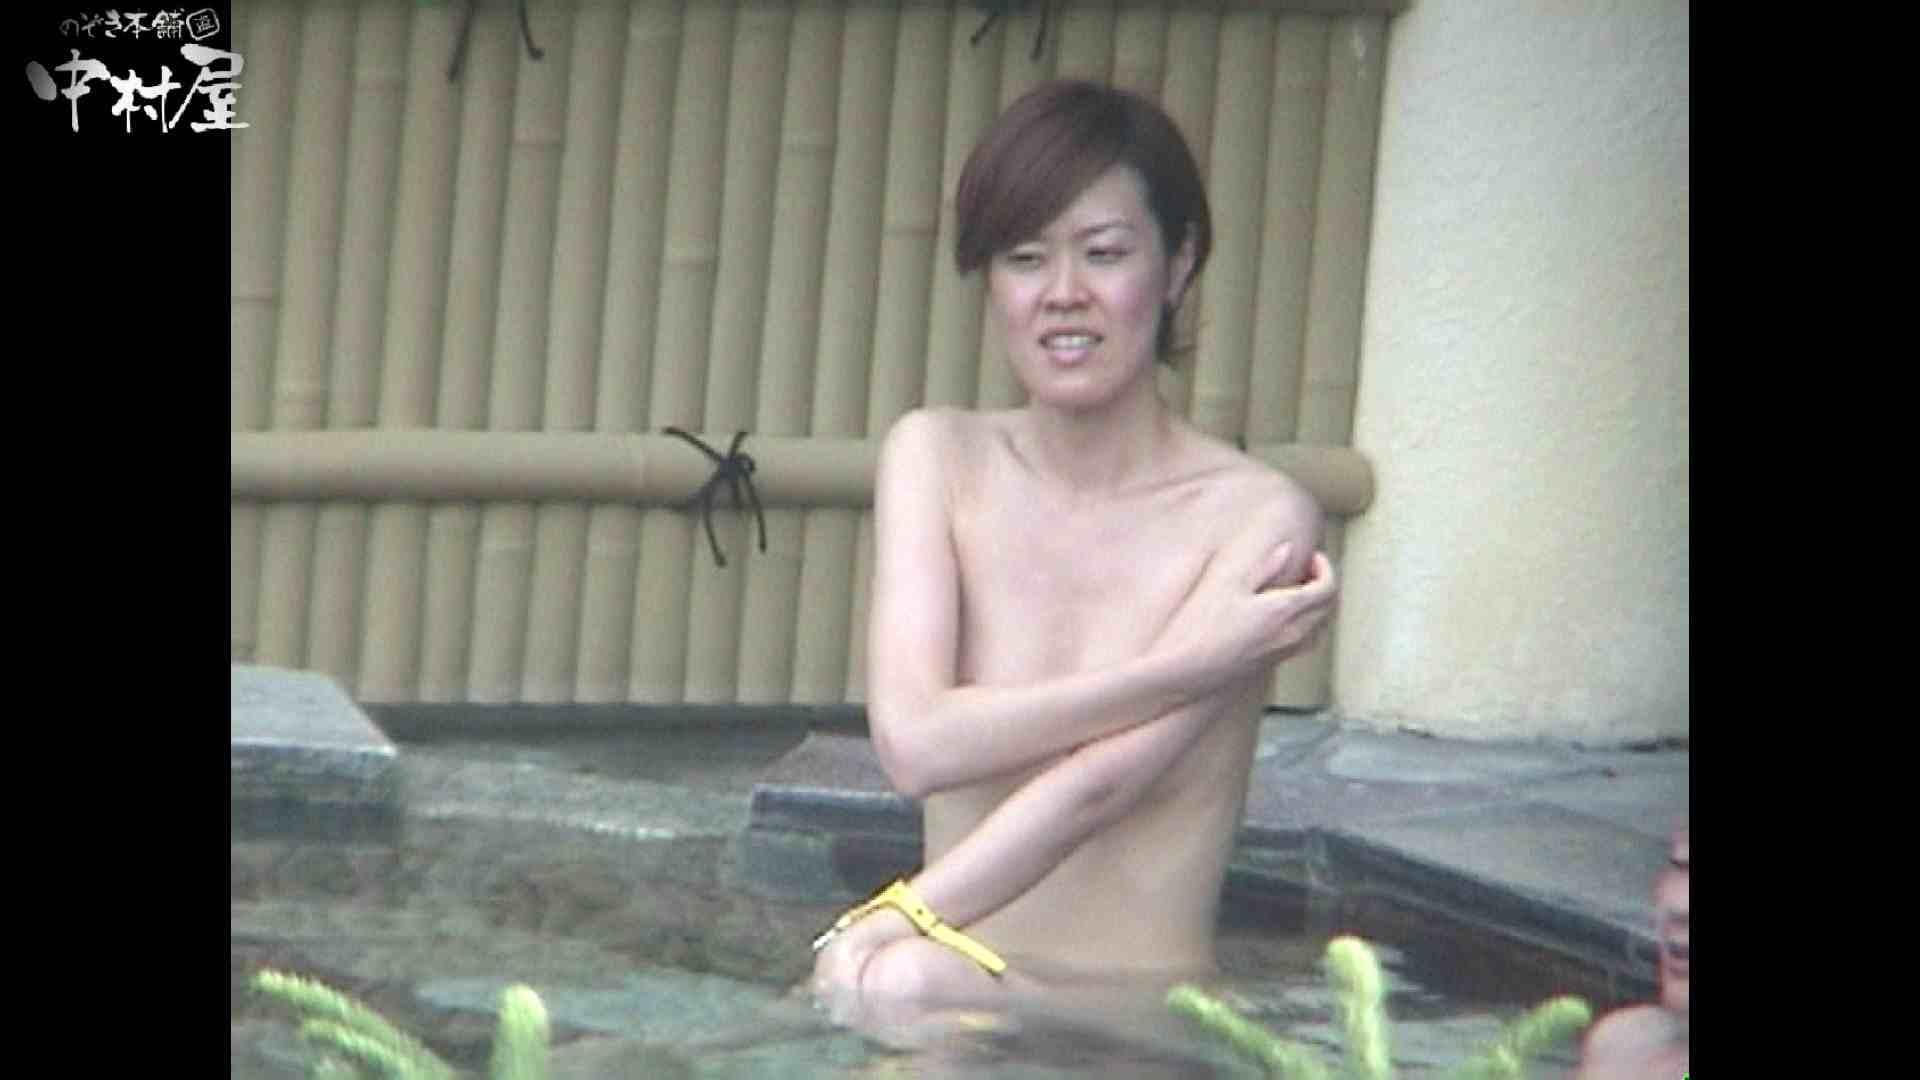 Aquaな露天風呂Vol.961 露天風呂 | OLのエロ生活  104連発 88